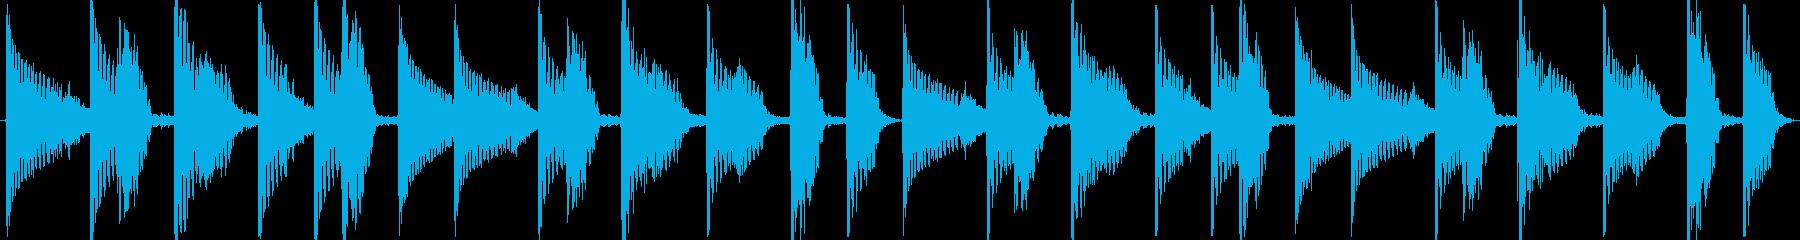 【EDM/ドラム/明るい場面転換】の再生済みの波形